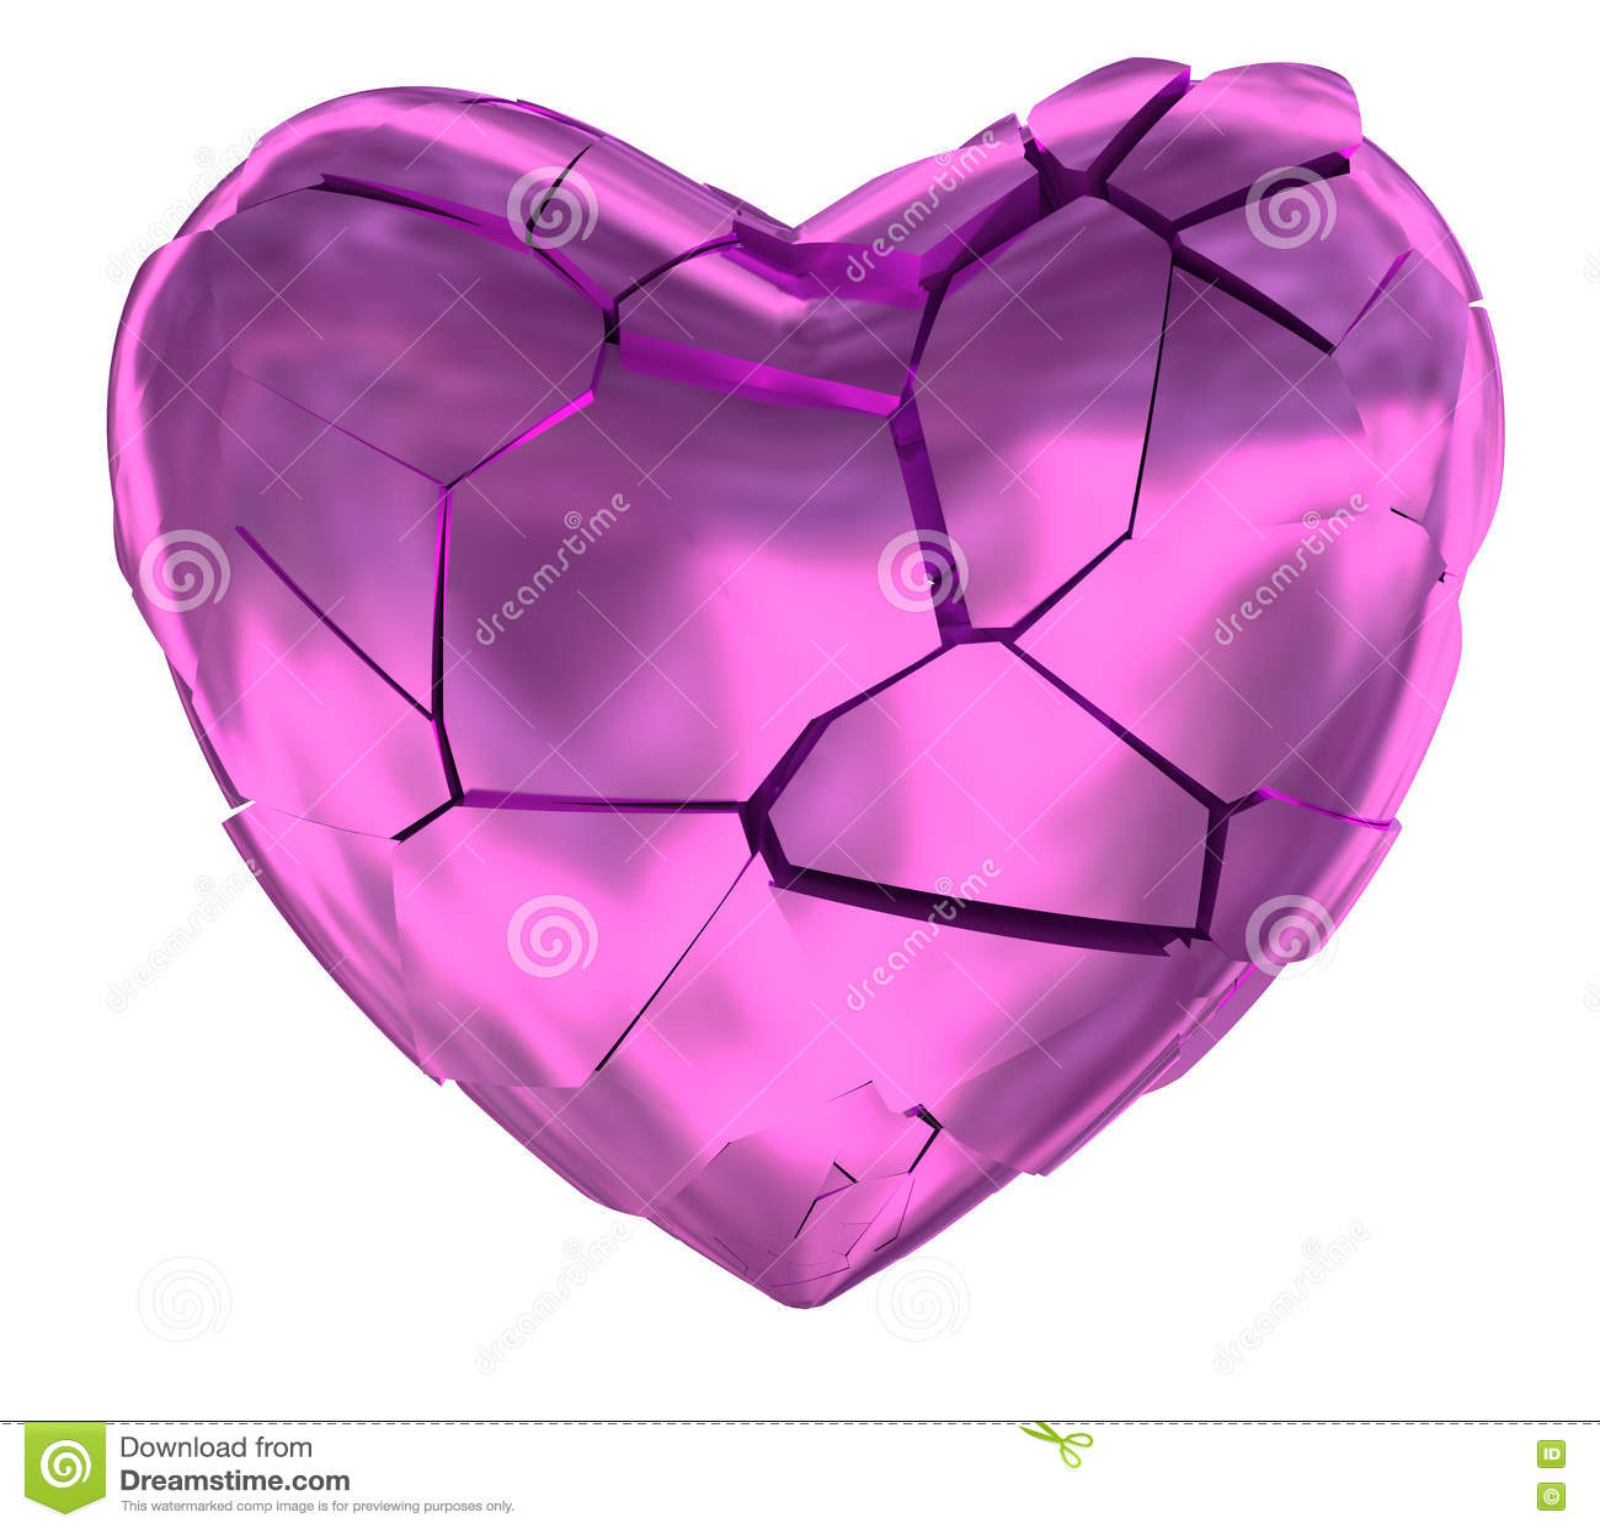 Broken heart glossy pink symbol stock illustration illustration broken heart glossy pink symbol buycottarizona